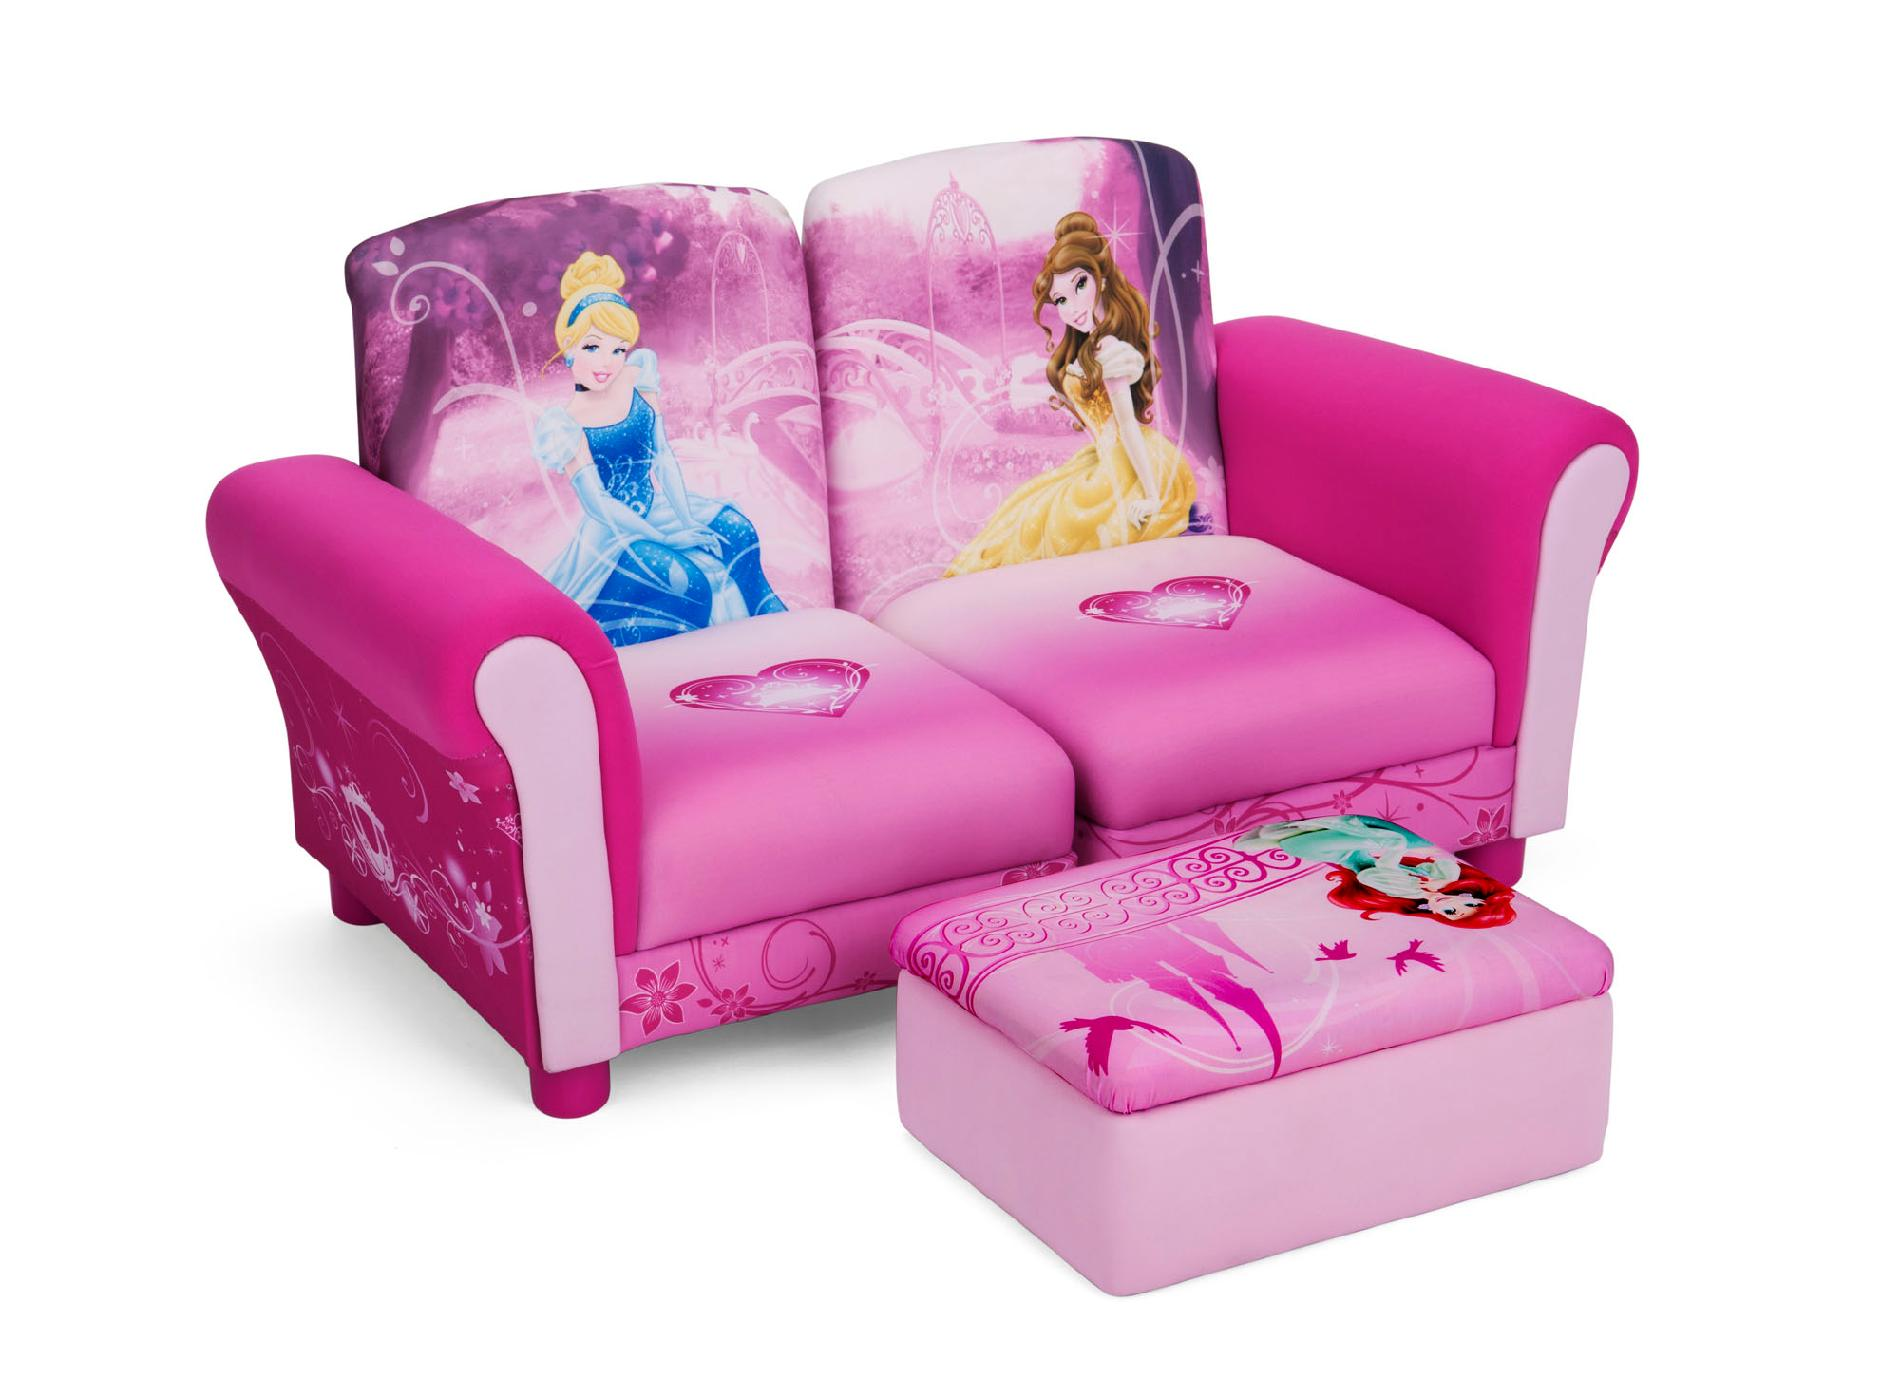 Disney Sofa Chair Disney Doc Mcstuffins Toddler 2 In 1